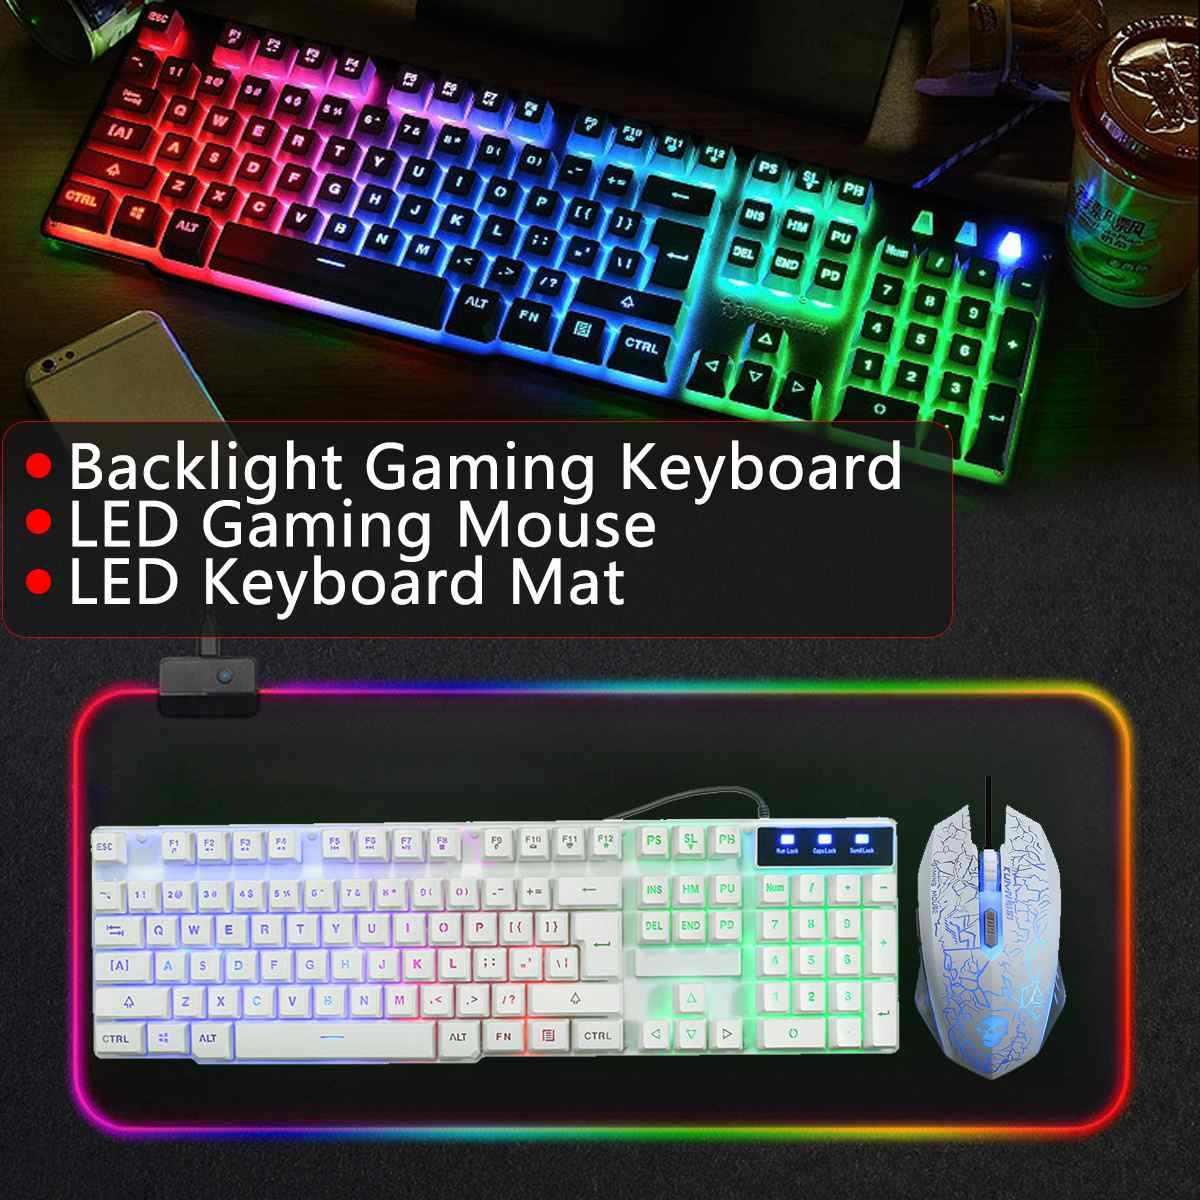 Bedrade/Draadloze Gaming Toetsenbord En Muis Set Regenboog Backlit Usb Toetsenbord Rgb Led Muismat Combo Set Voor Pc gamer Laptop